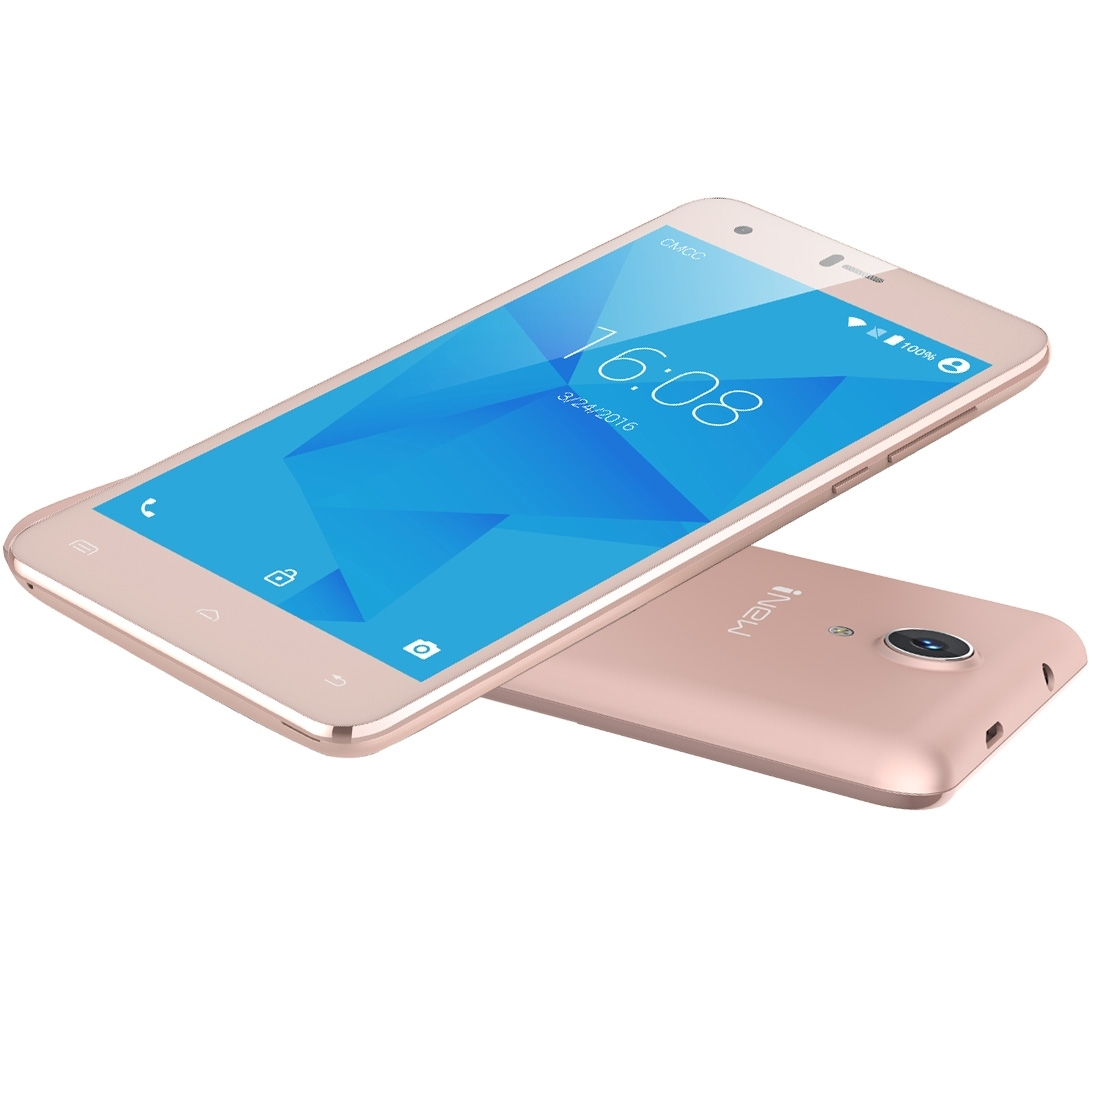 INEW U8W 5 5 inch 3G WCDMA Phone Andriod 5 1 MTK6580 Quad Core 1 3GHz 8GB  ROM 1GB RAM Dual SIM HD Original Mobile Phone-in Mobile Phones from Phones  &